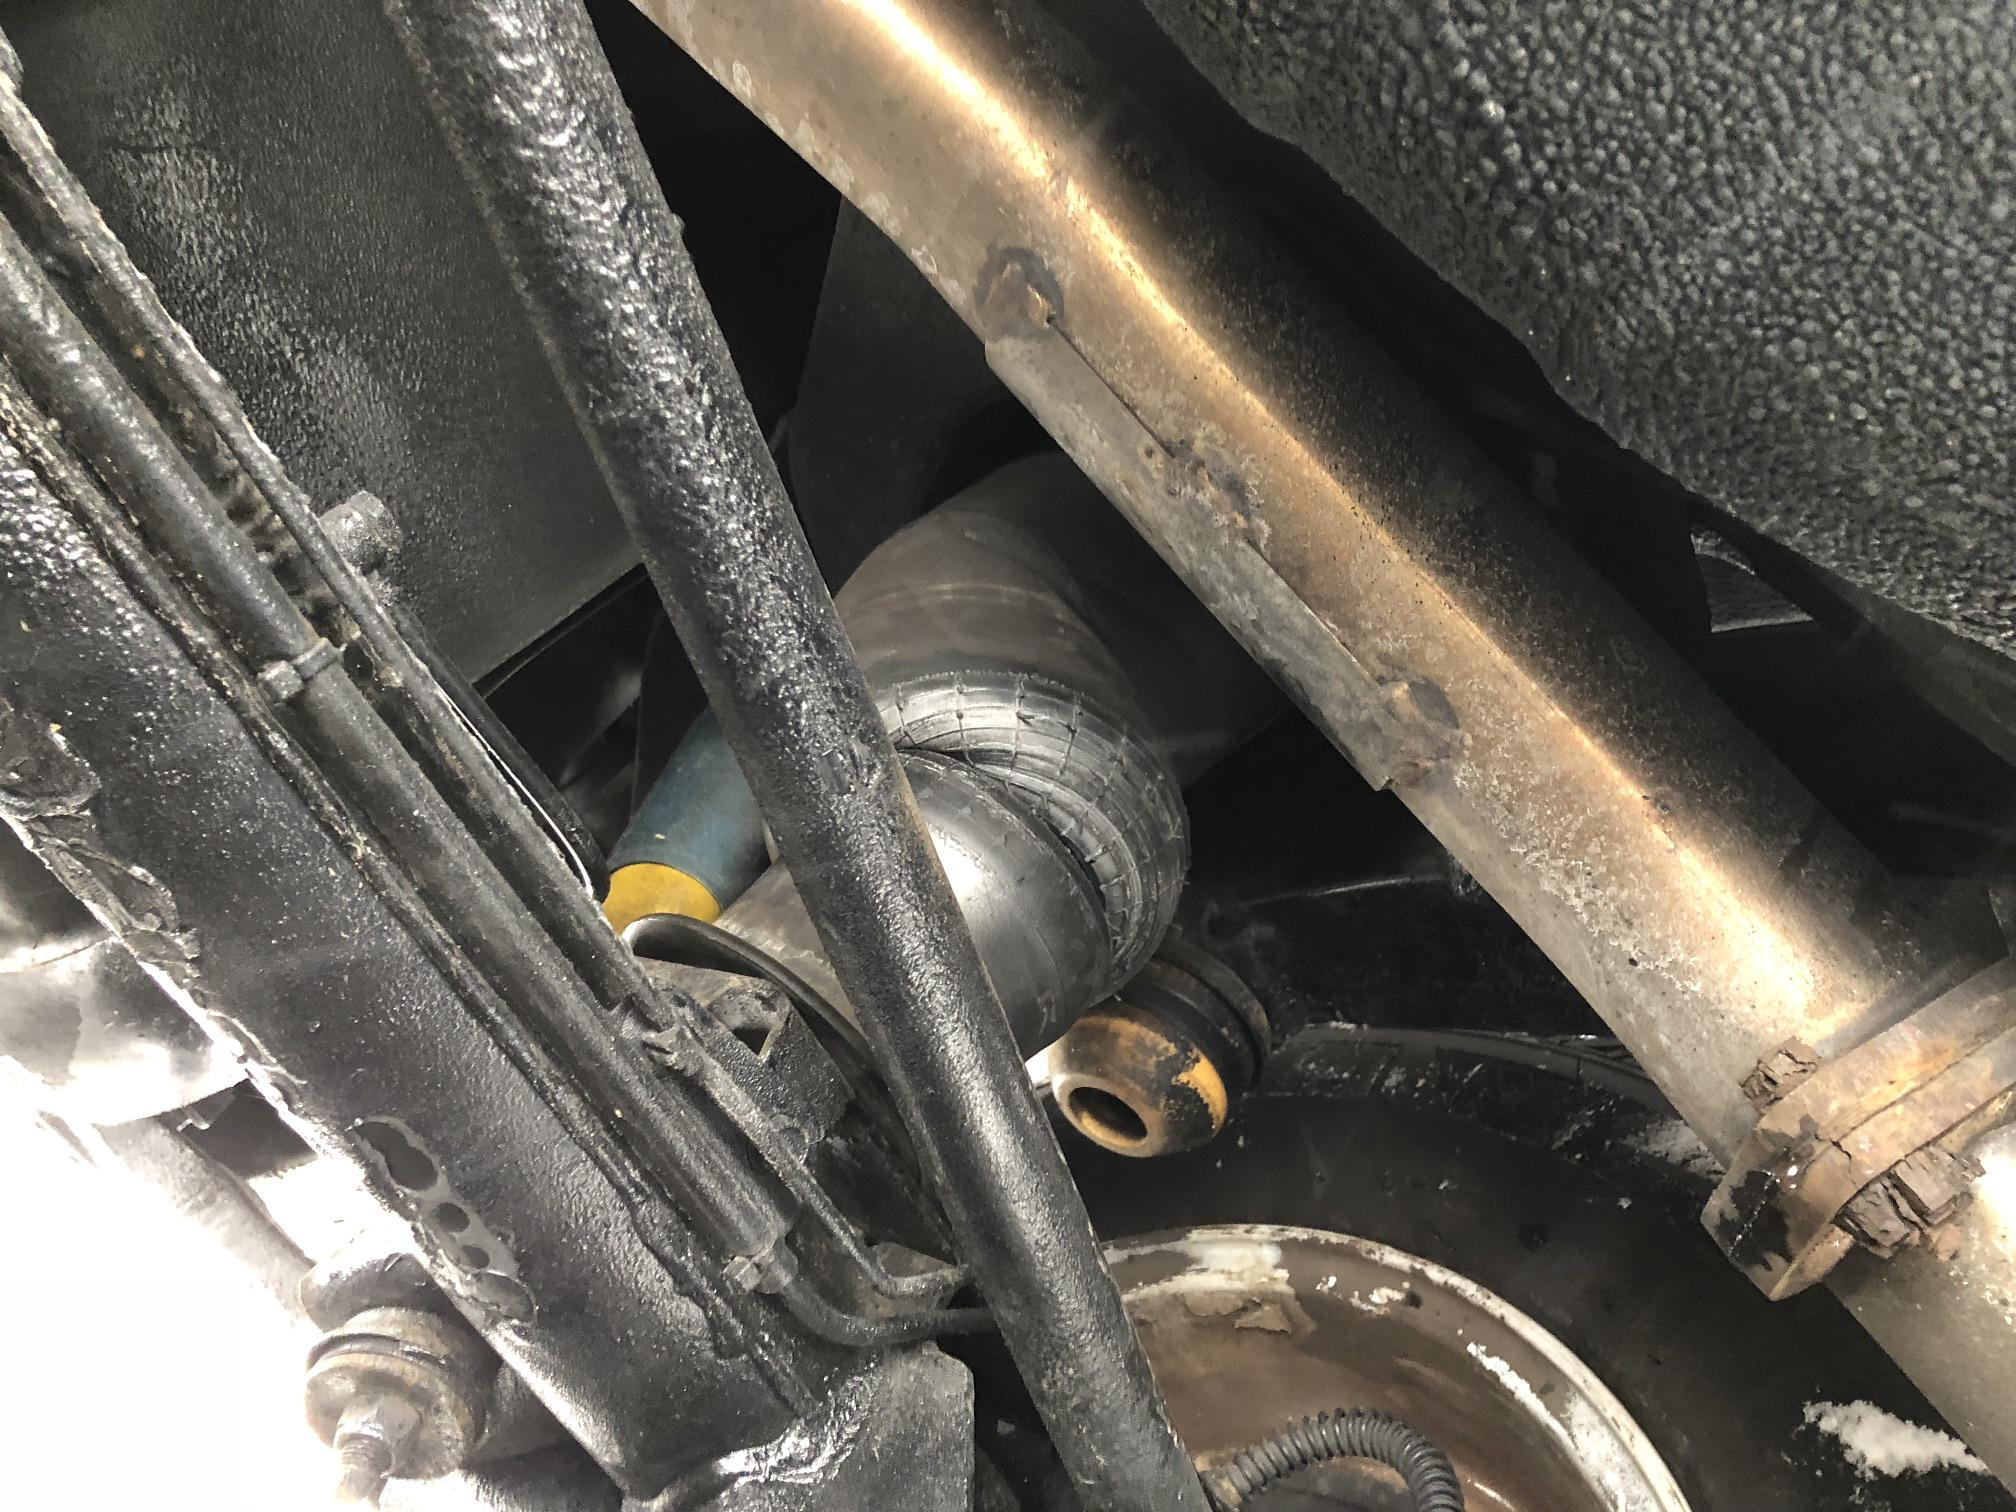 https://p38a.net/repair/IMG_8155.jpg